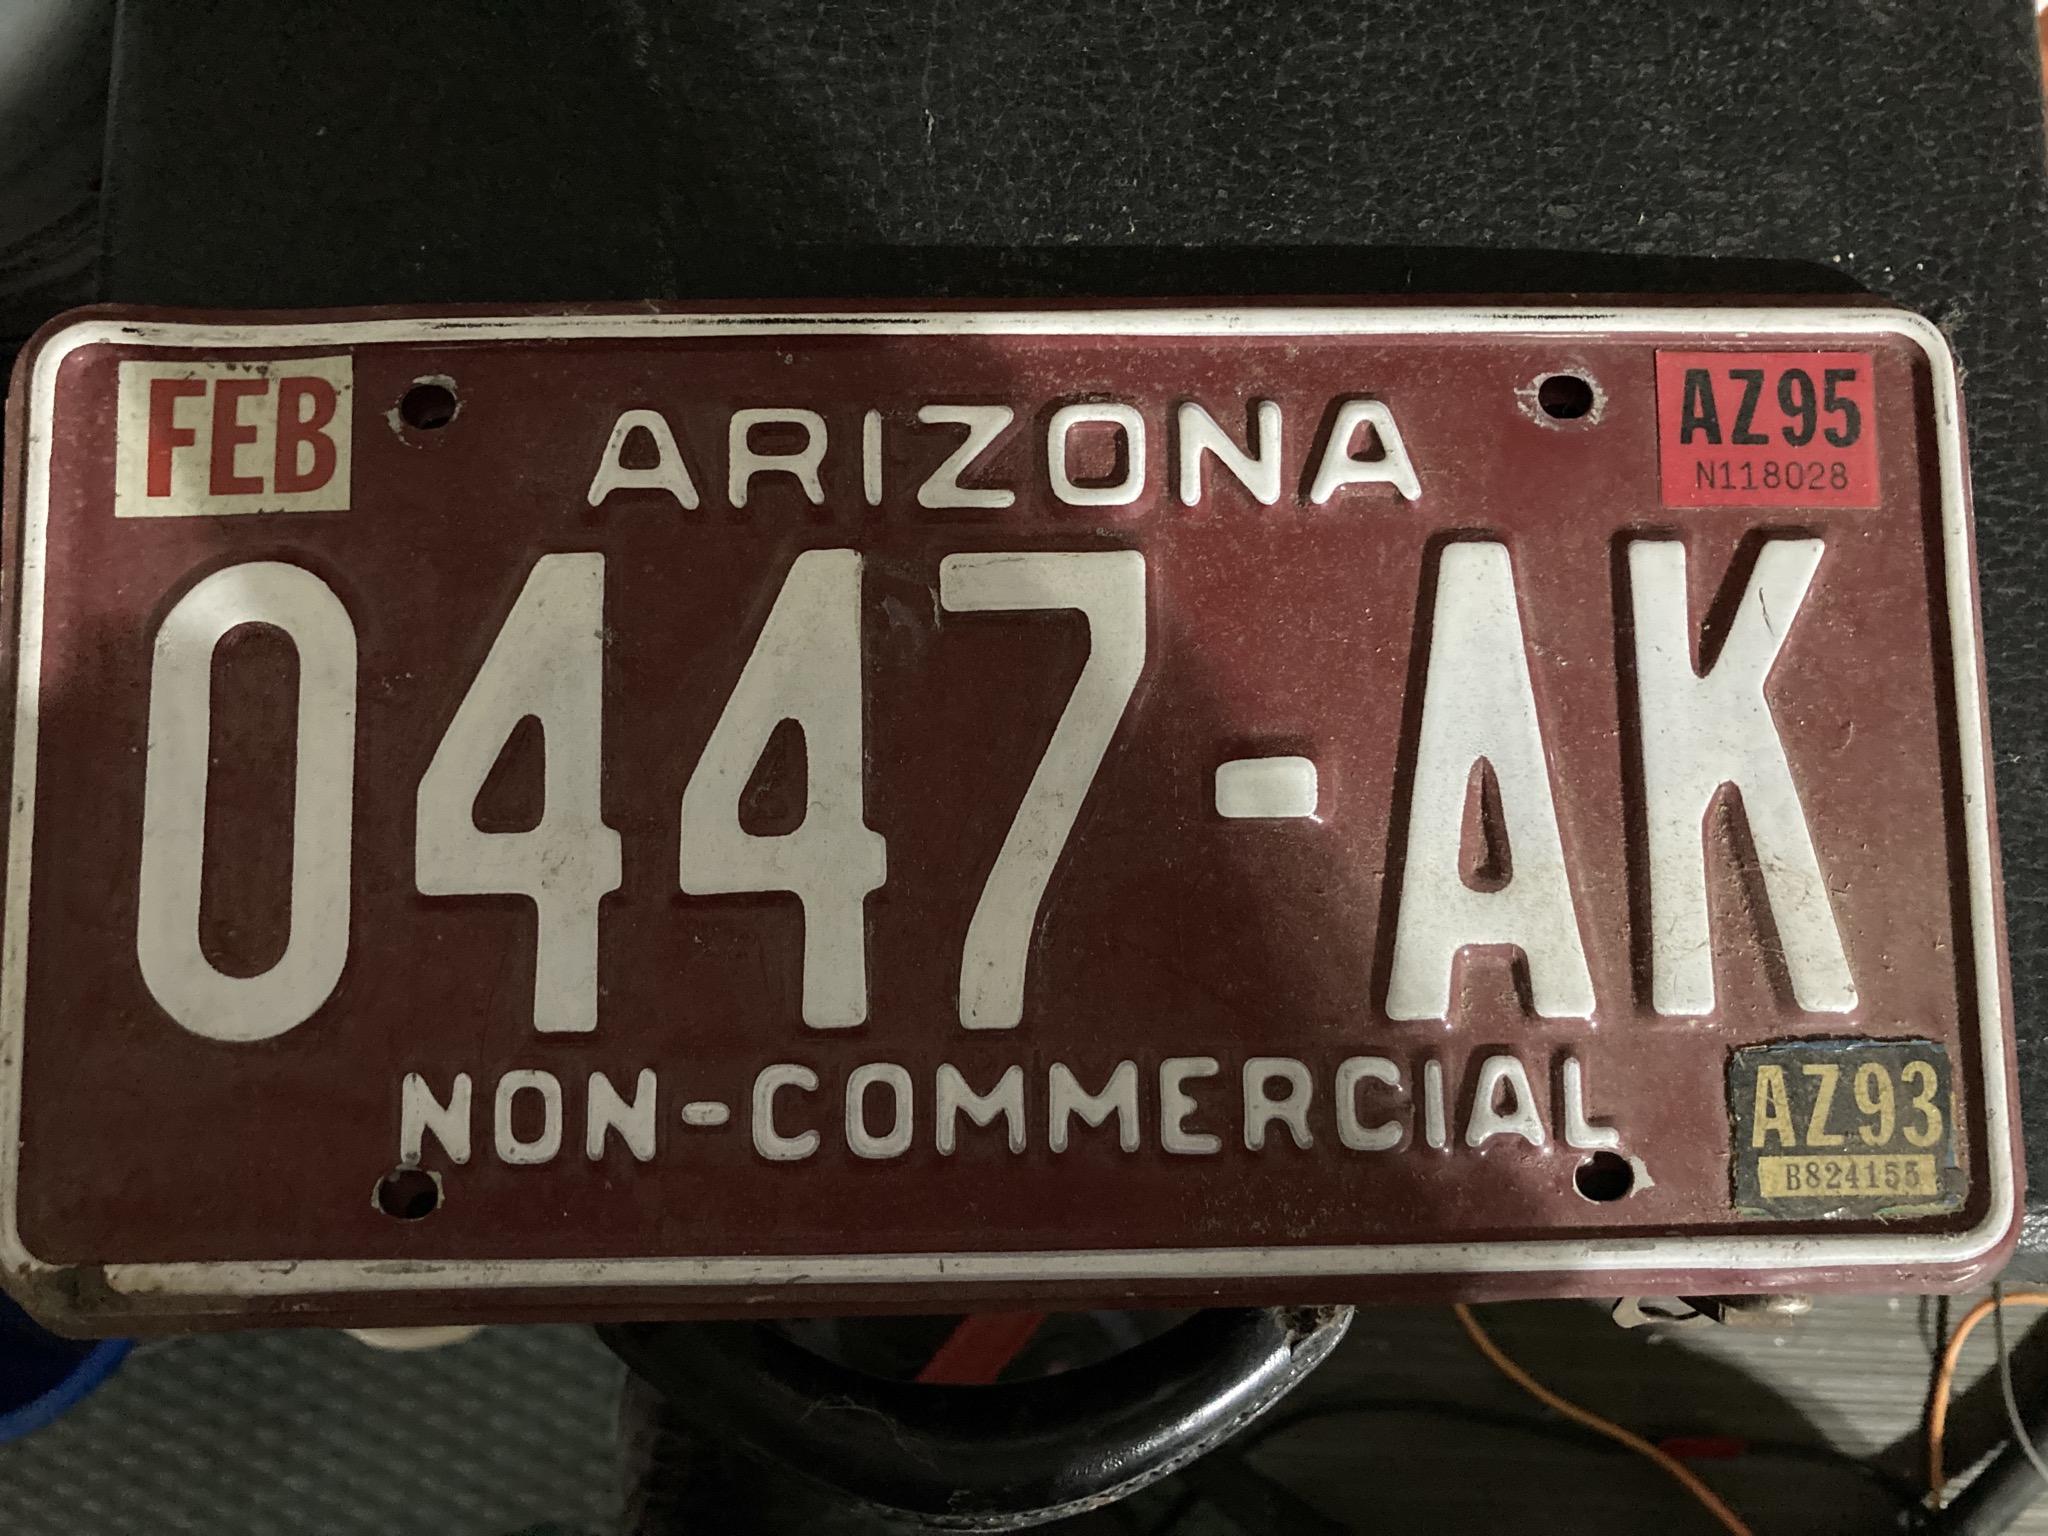 ACA387D6-DE1C-424A-A2A5-4CC53523CE8A.jpeg